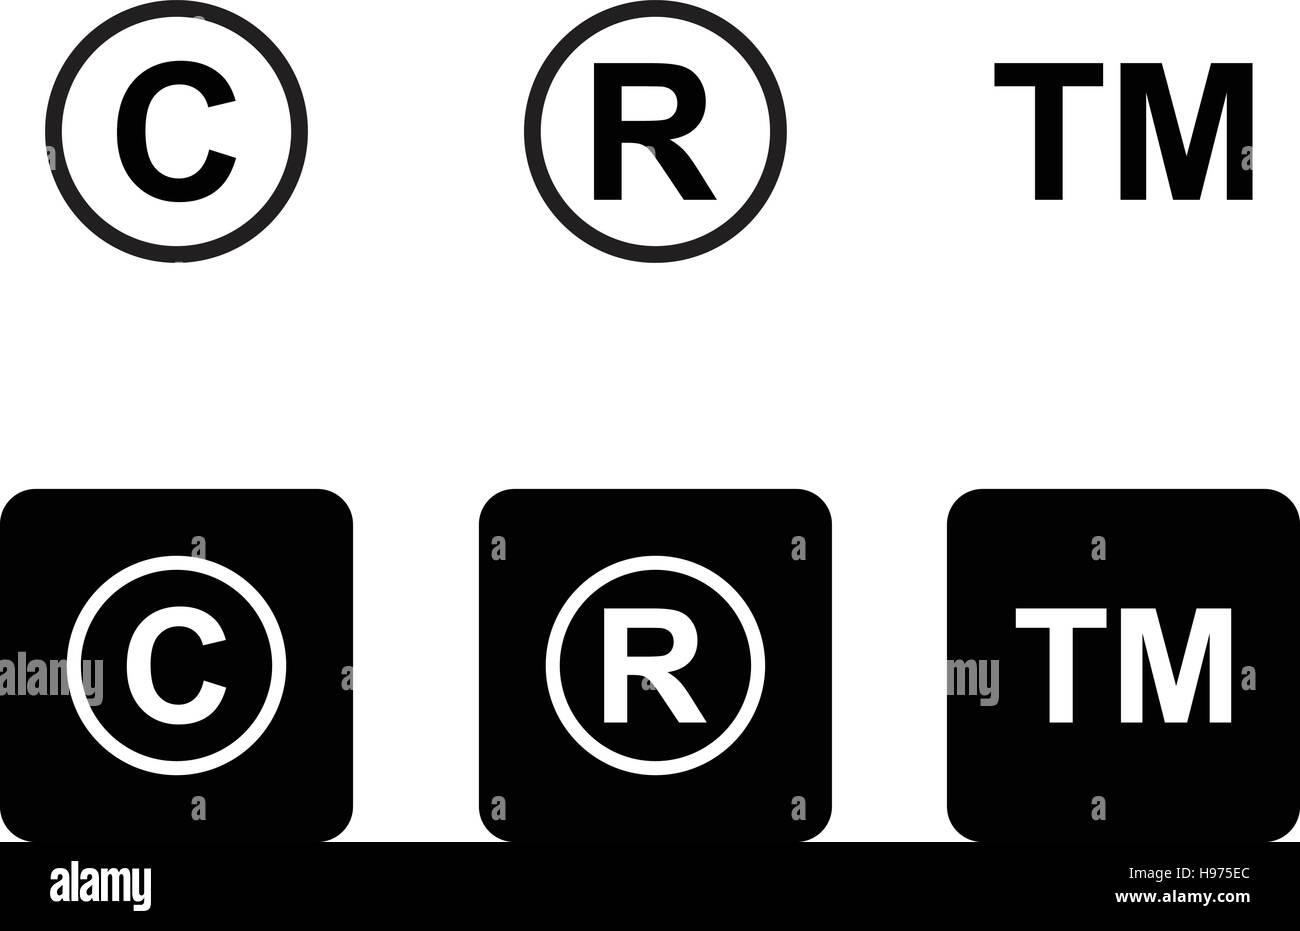 Copyright trademark icons set stock vector art illustration copyright trademark icons set buycottarizona Choice Image